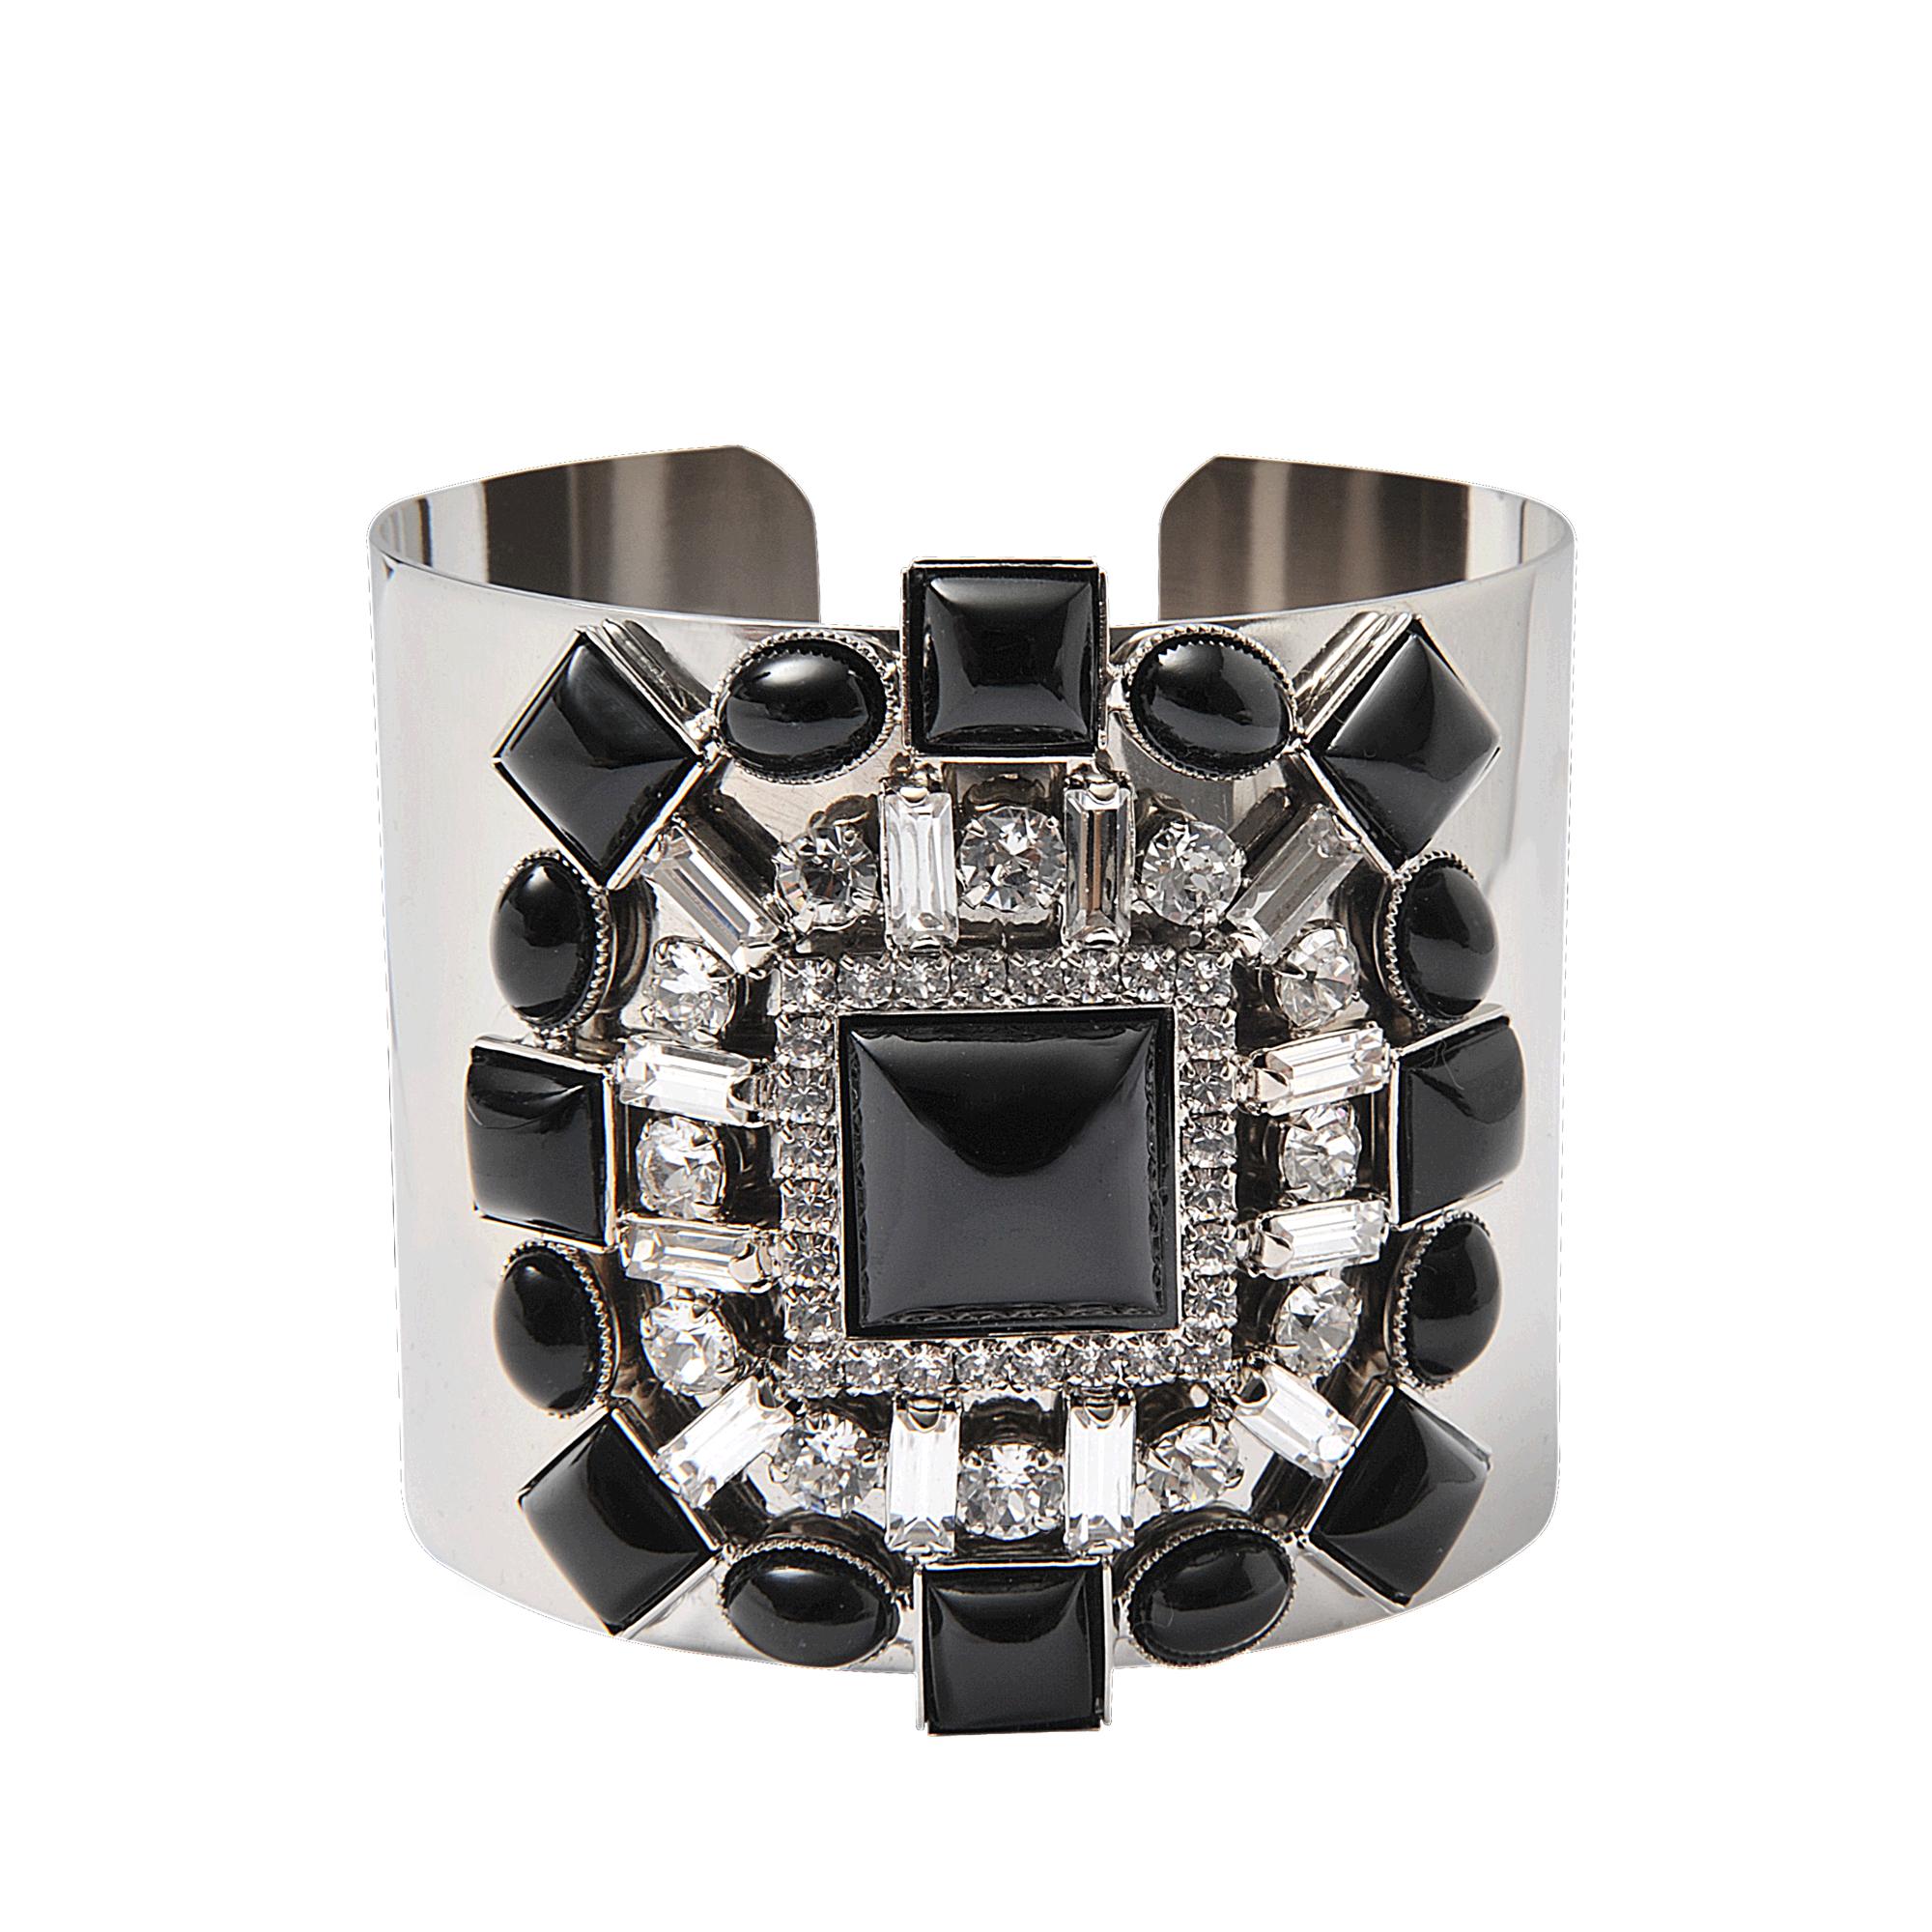 Helene Zubeldia Crystals Cascade Open Bracelet in Ruthenium and Crystals XR3TkiQ